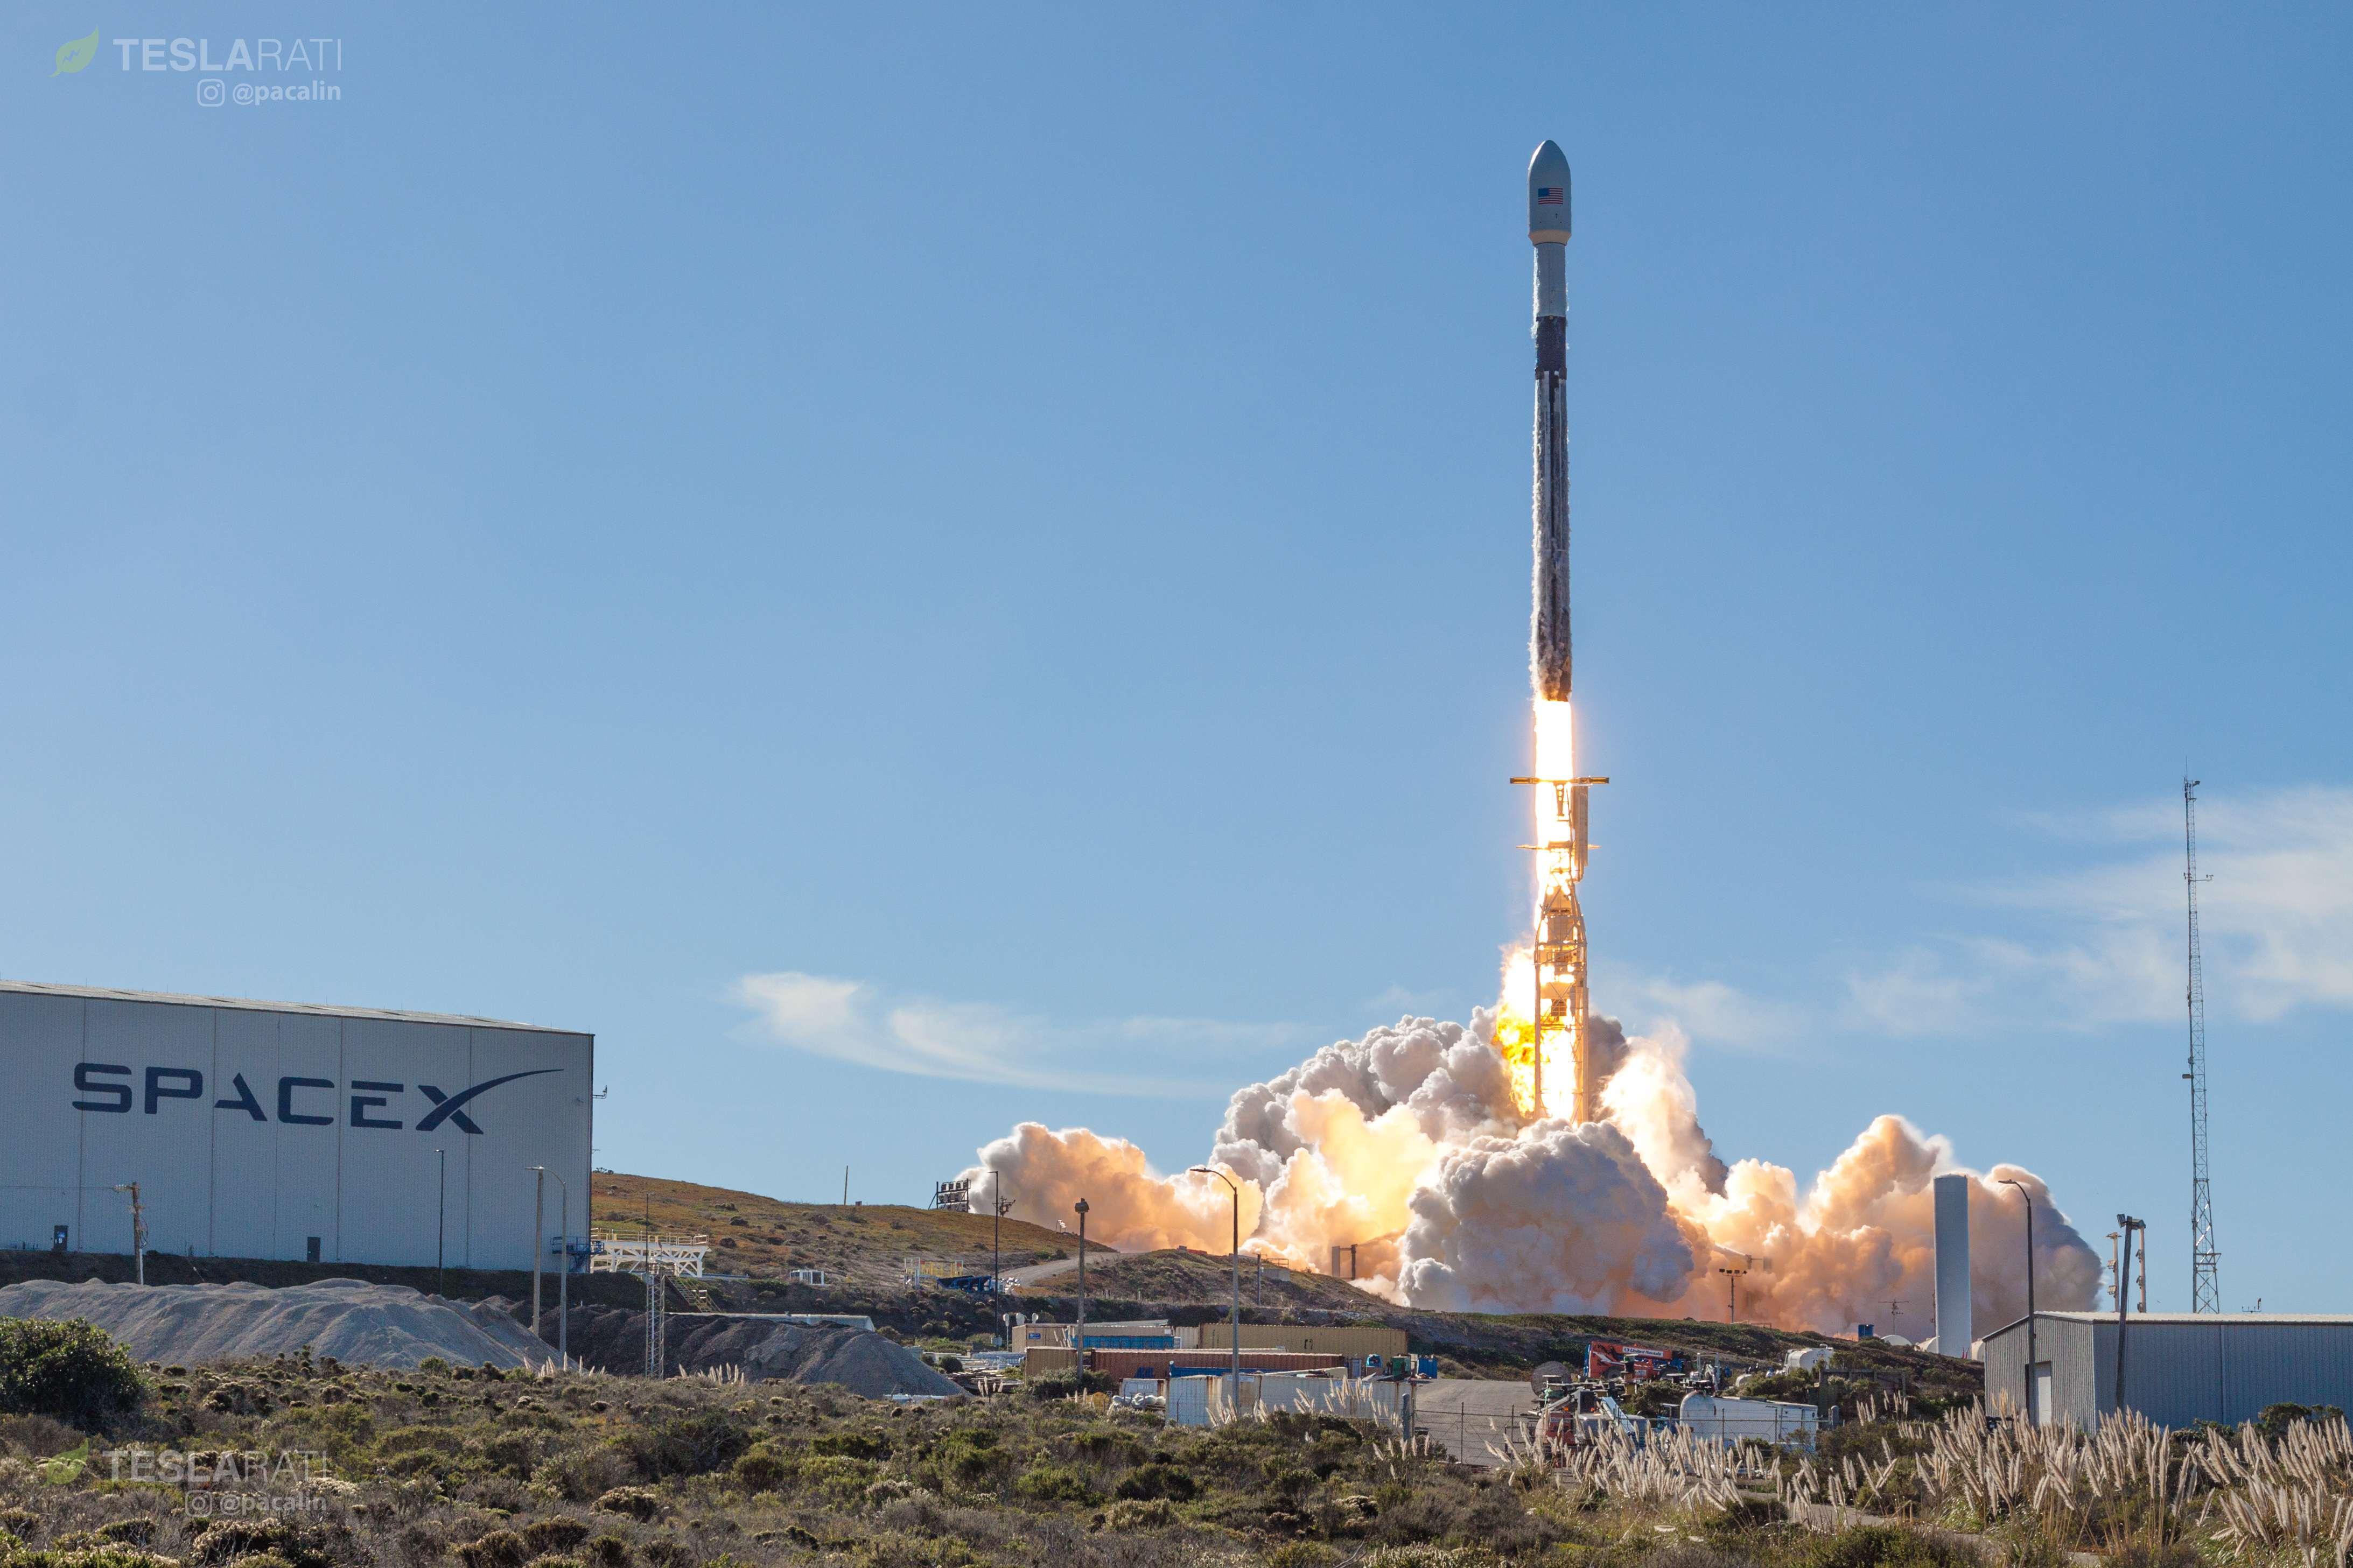 Falcon 9 B1046 SSO-A liftoff (Pauline Acalin) 1(c)